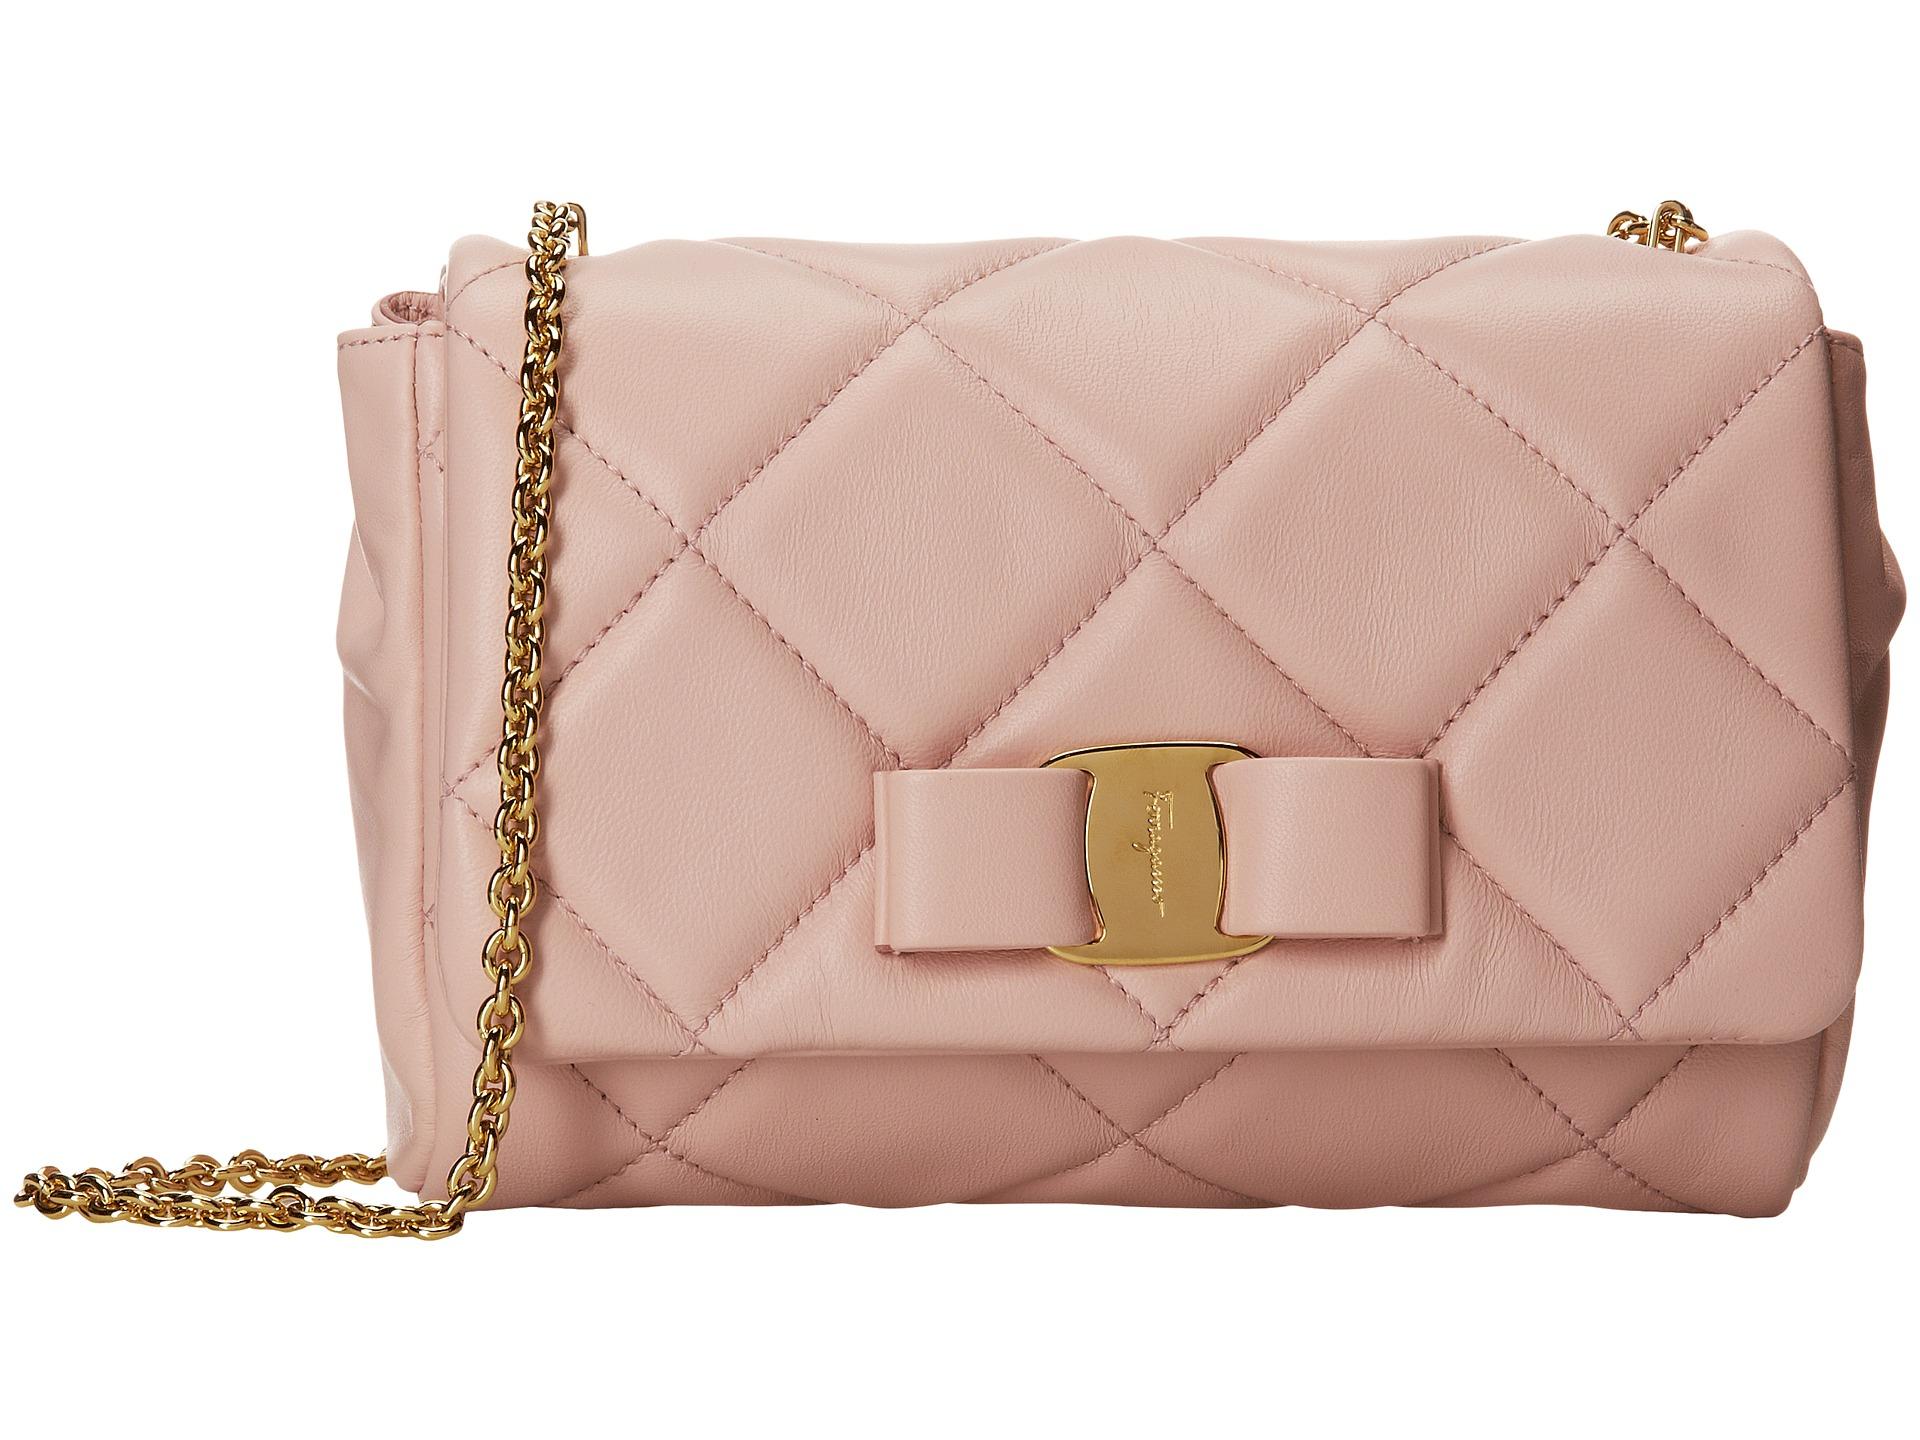 4c3f662a4463 Lyst - Ferragamo Miss Vara Quilted Mini Bag - Macaron in Pink